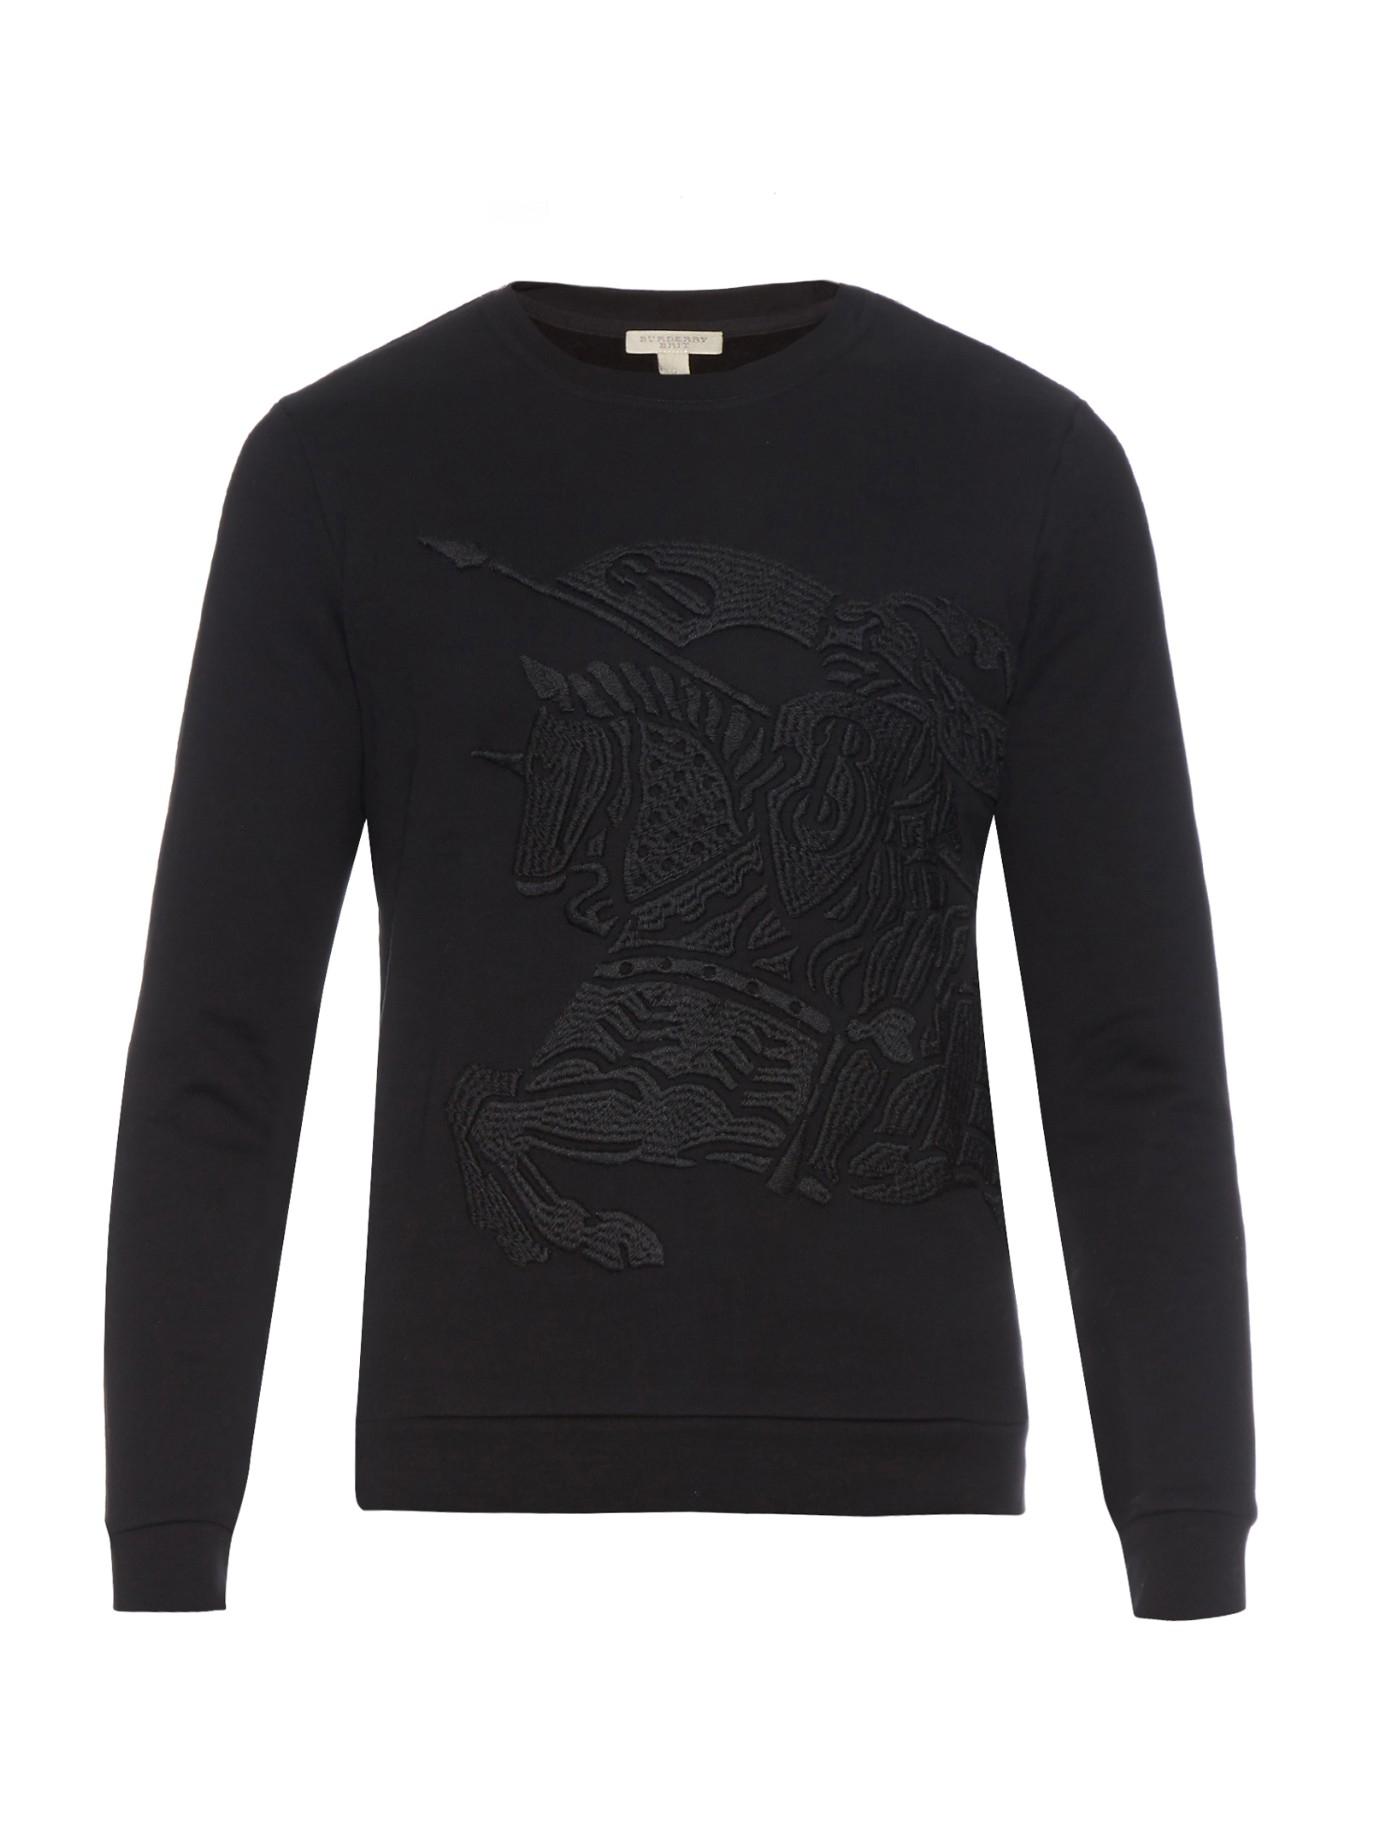 Lyst Burberry Brit Embroidered Cotton Jersey Sweatshirt